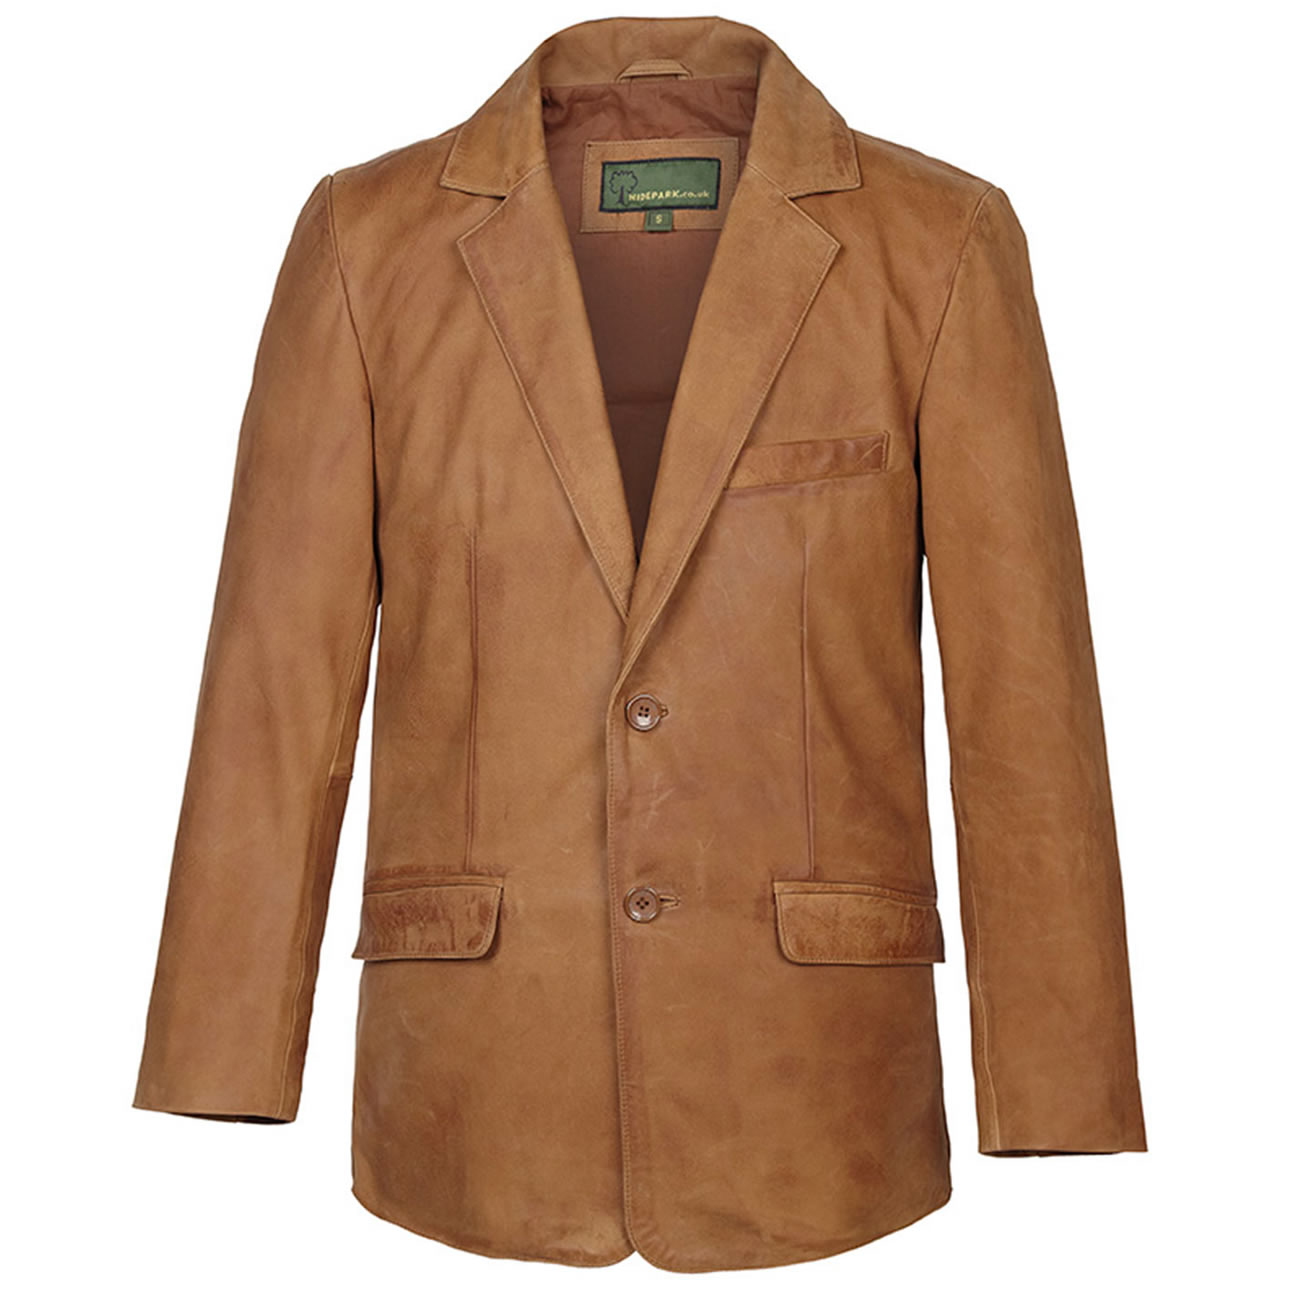 Gents Nubuck Leather Blazer Tan